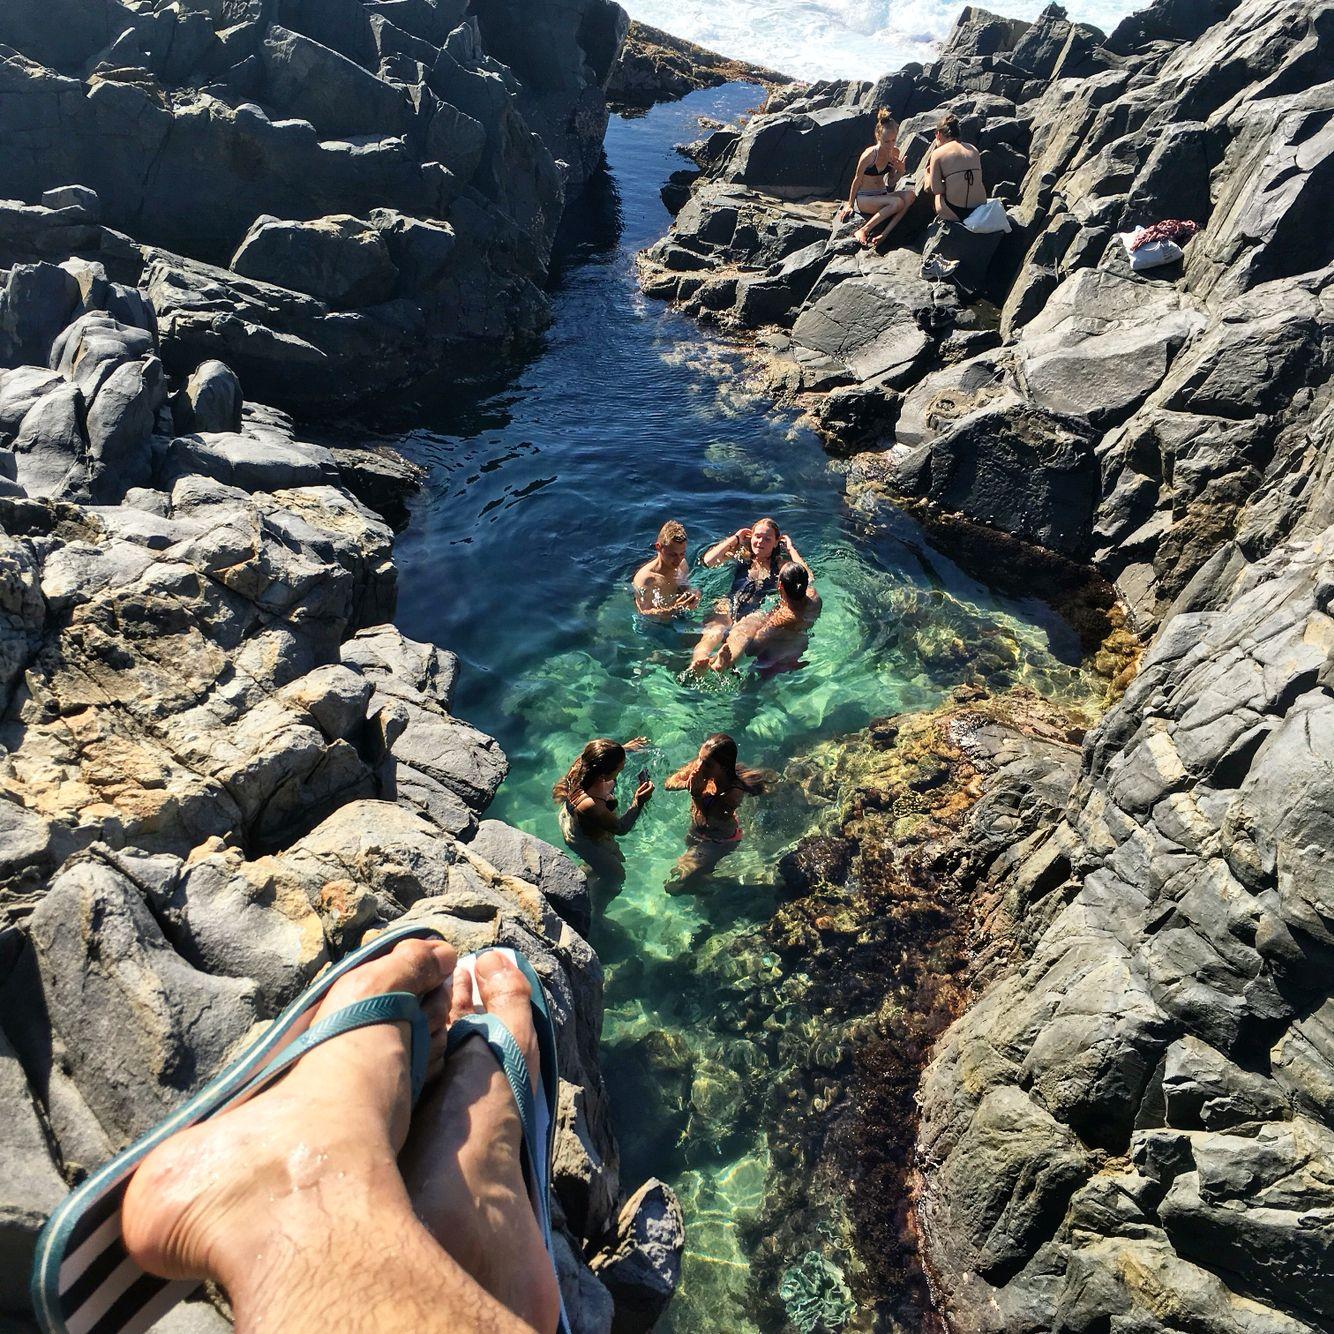 Trampoline Springs Sunshine Coast: Fairy Pools At Noosa National Park, Qld, Australia!